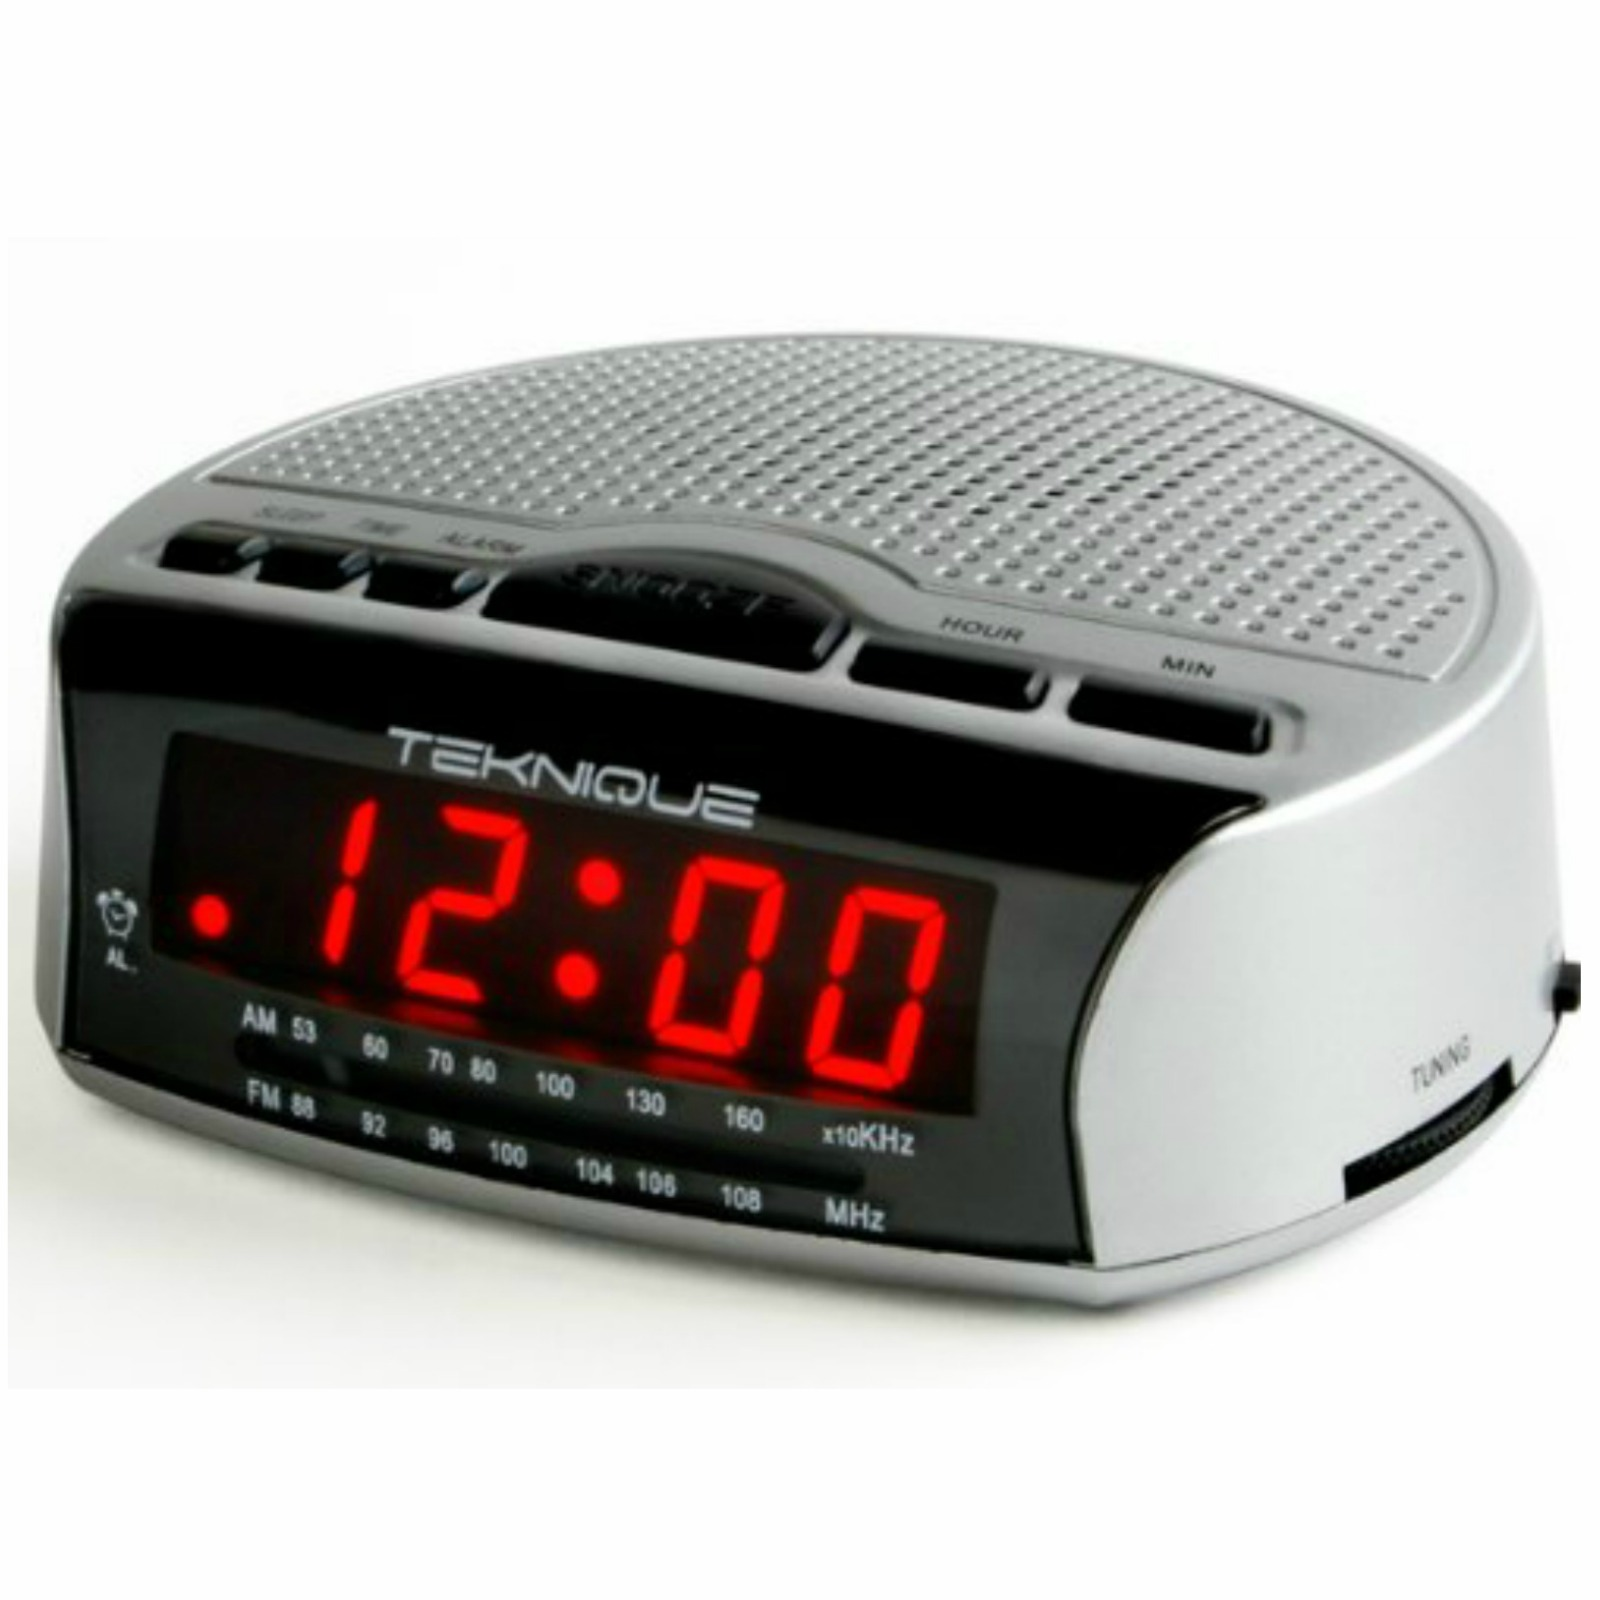 teknique t175 alarm clock radio silver ebay. Black Bedroom Furniture Sets. Home Design Ideas